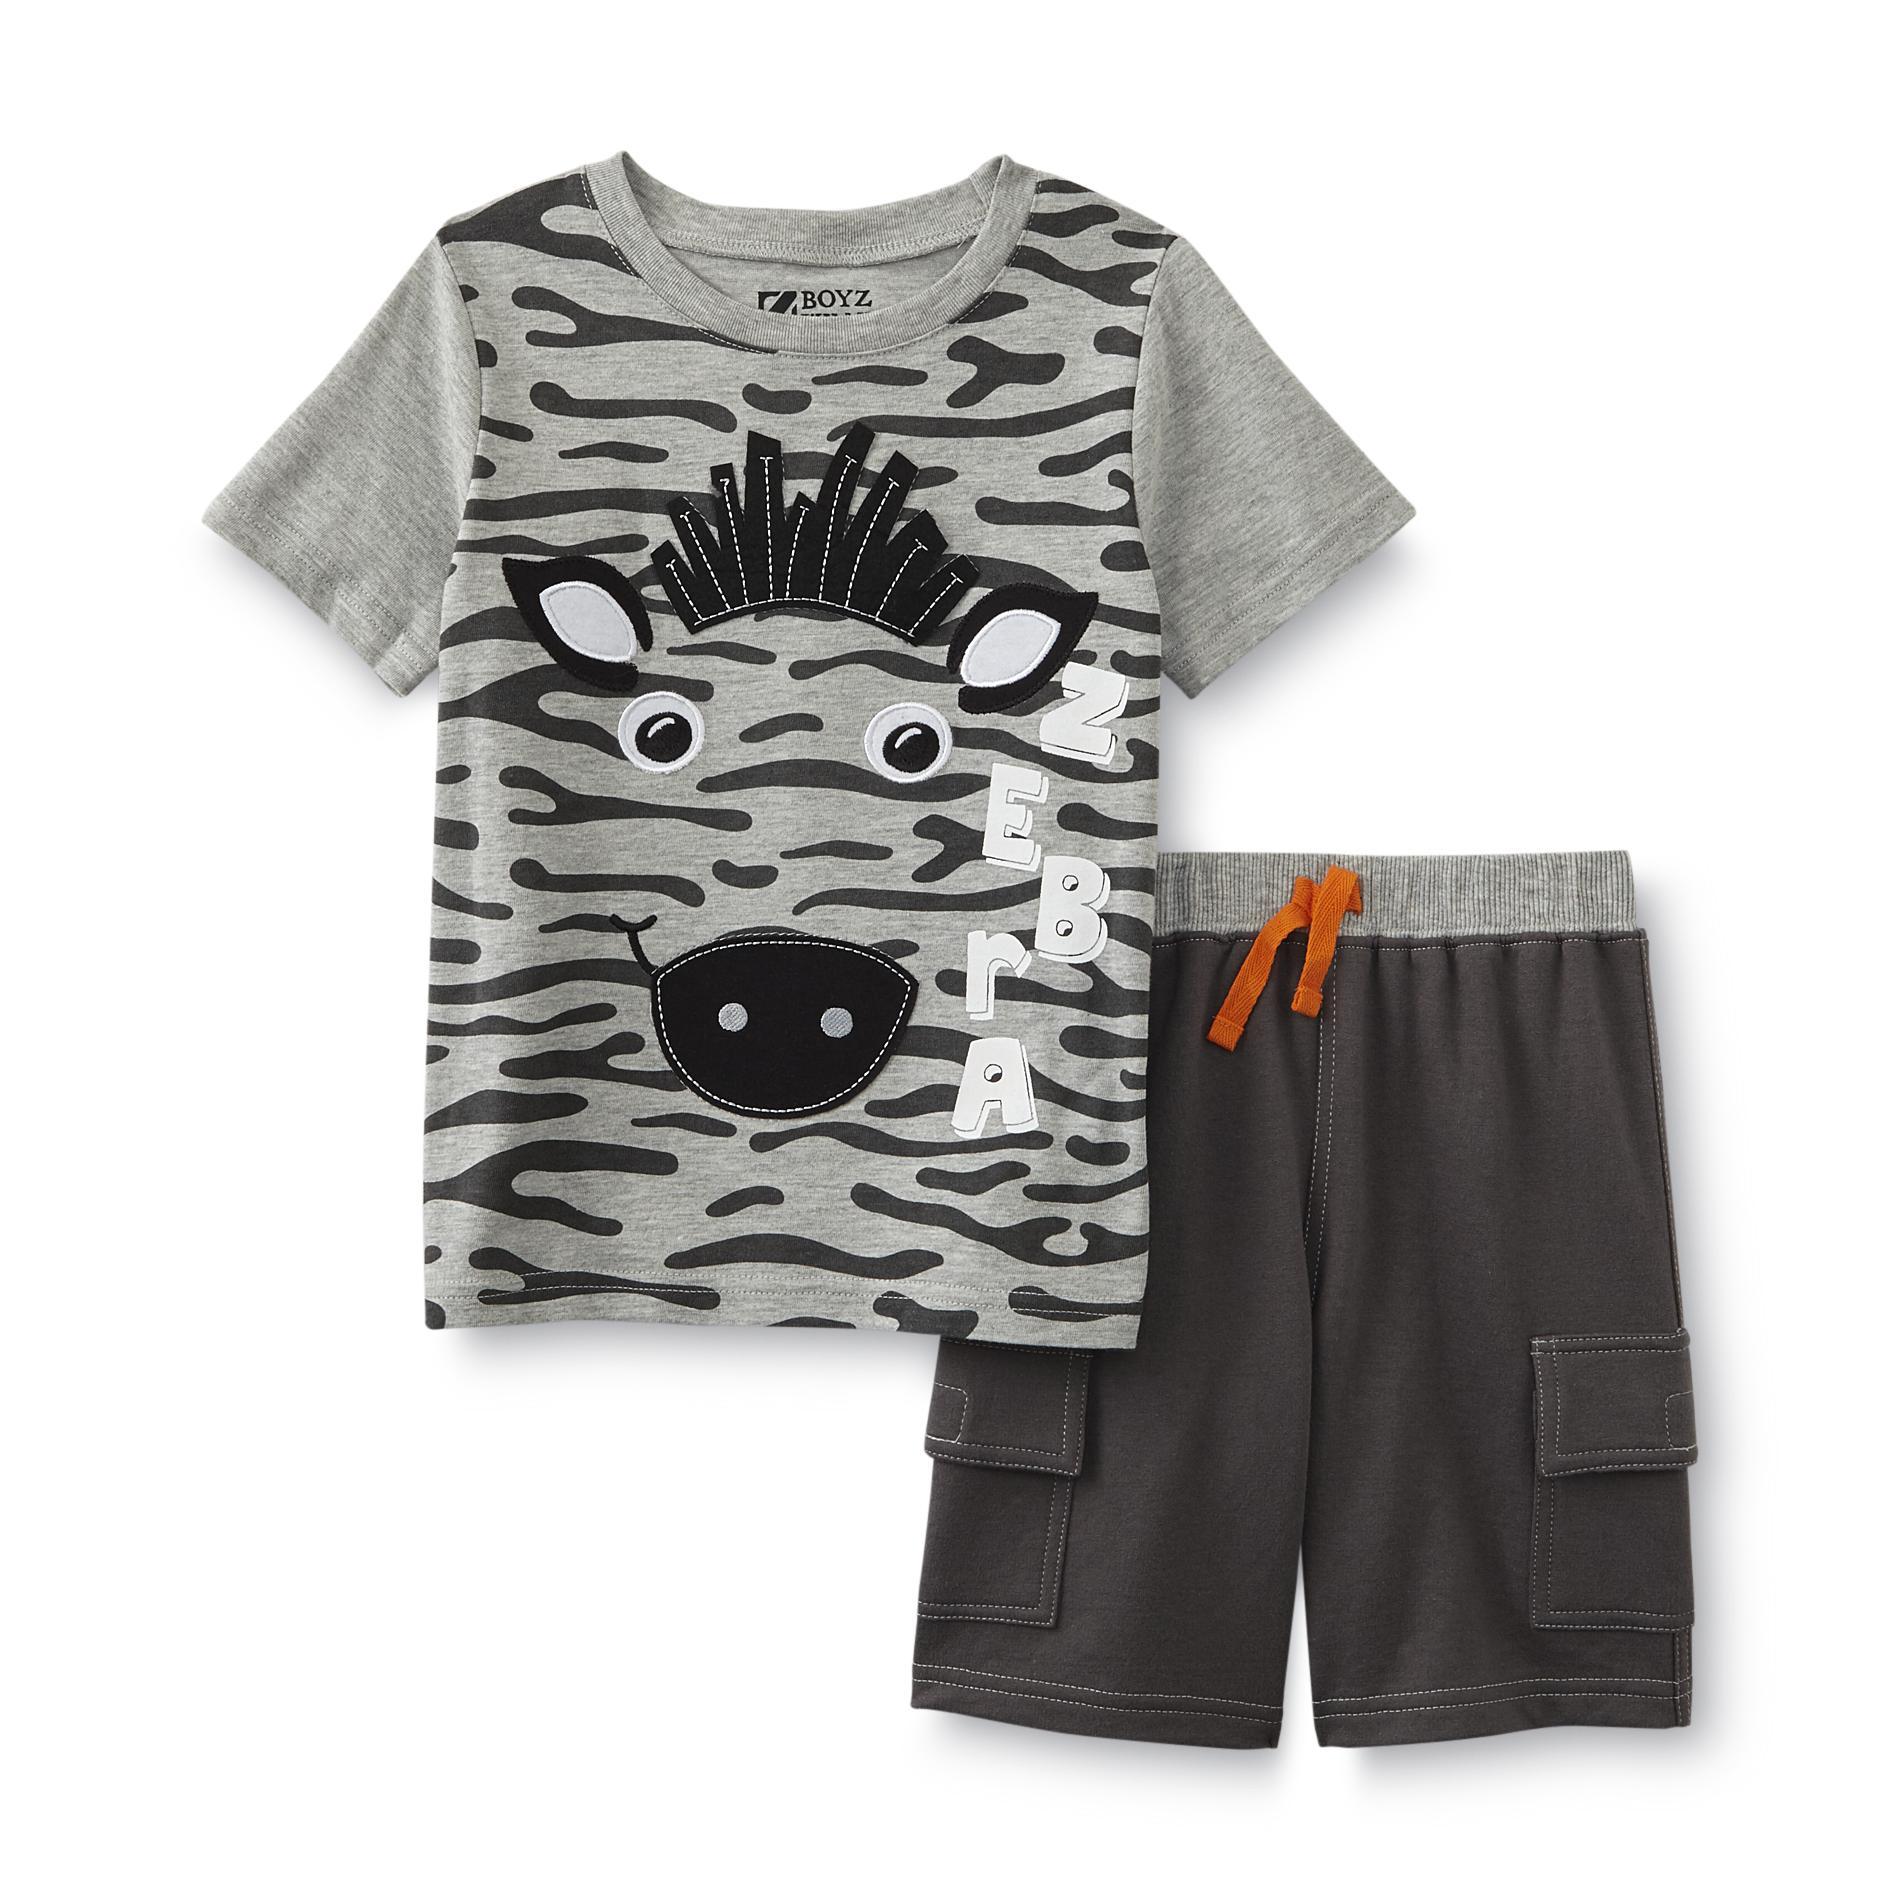 Infant & Toddler Boy's Graphic T-Shirt & Shorts - Zebra